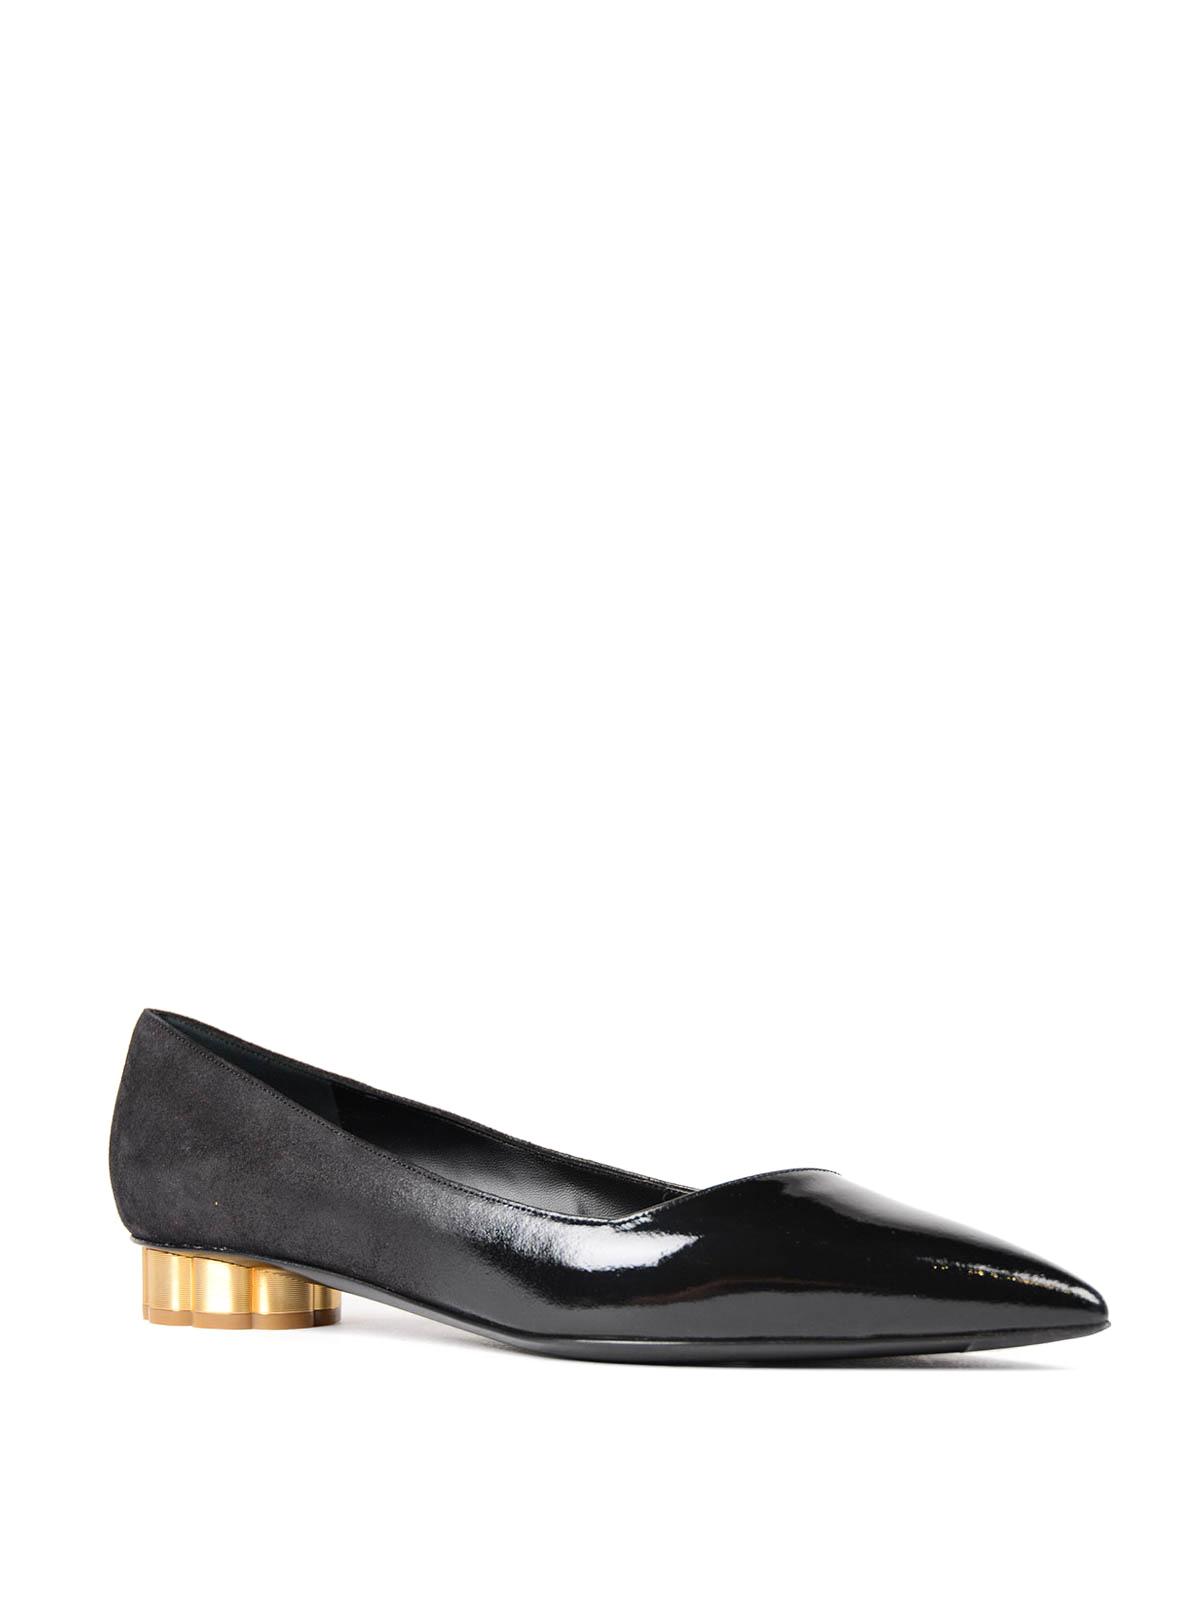 4560be503 SALVATORE FERRAGAMO: flat shoes online - Bari flower heel flats